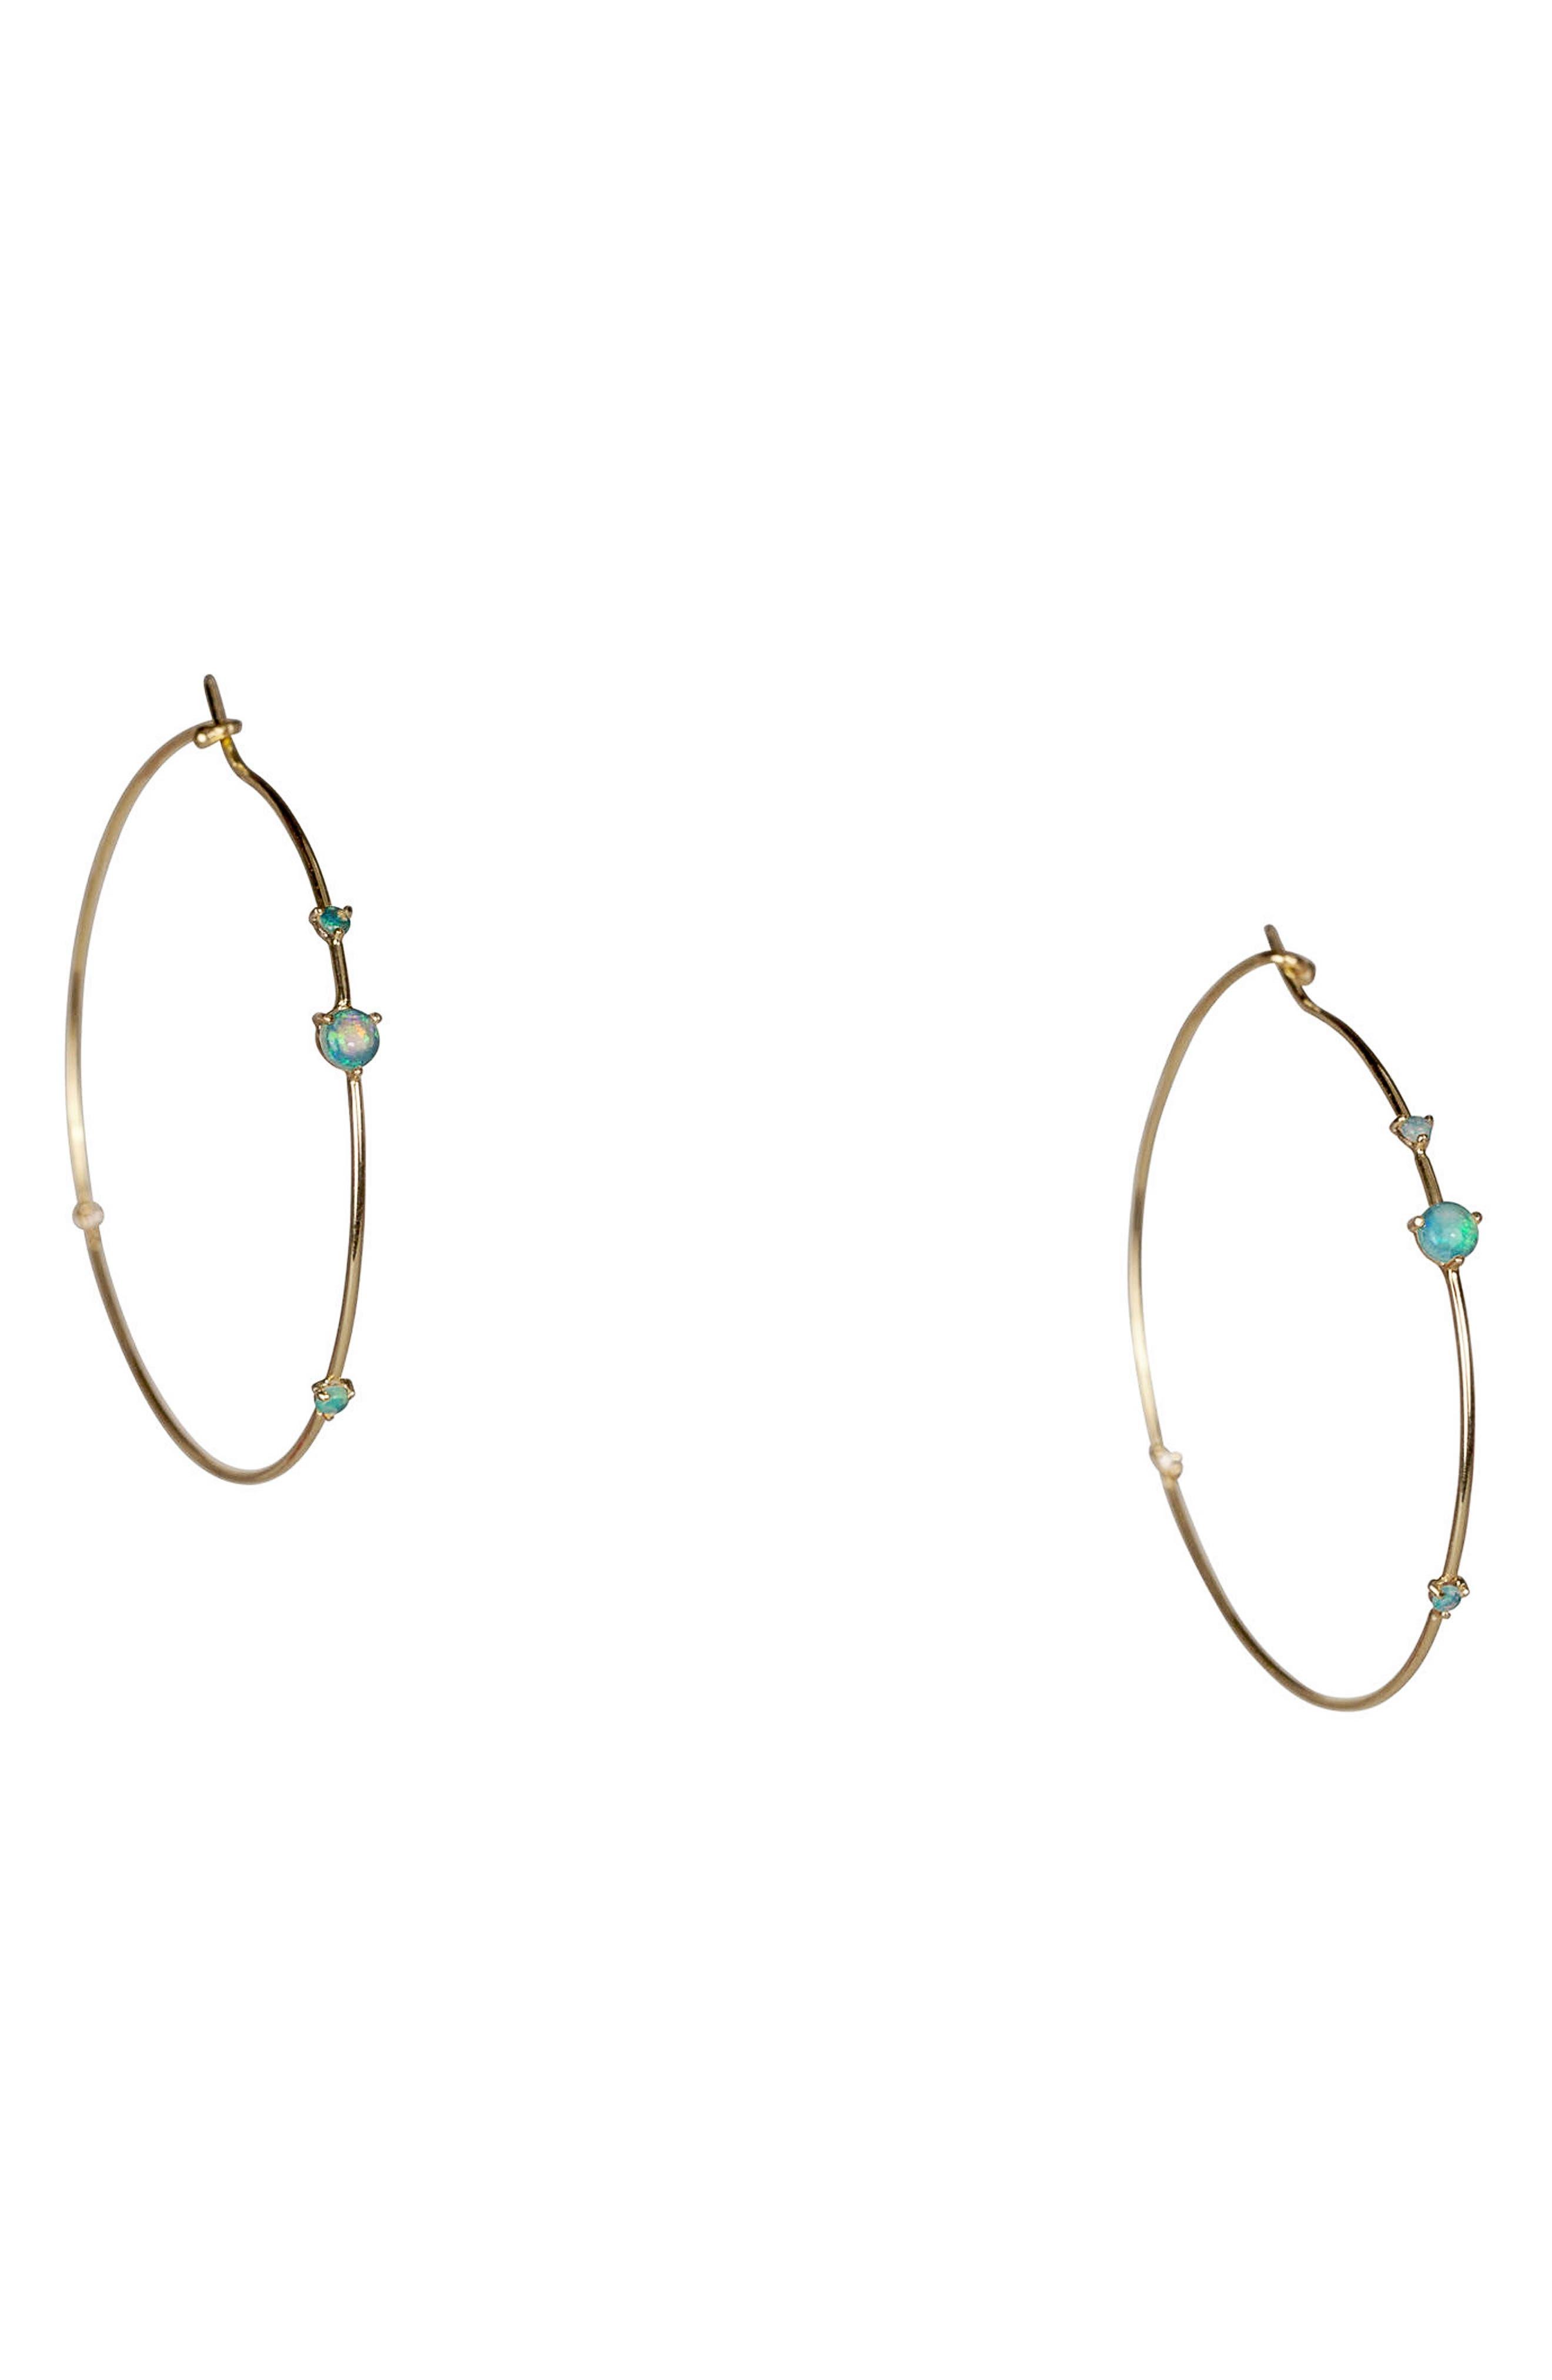 Four-Step Opal & Diamond Hoop Earrings,                             Main thumbnail 1, color,                             OPAL AND WHITE DIAMOND